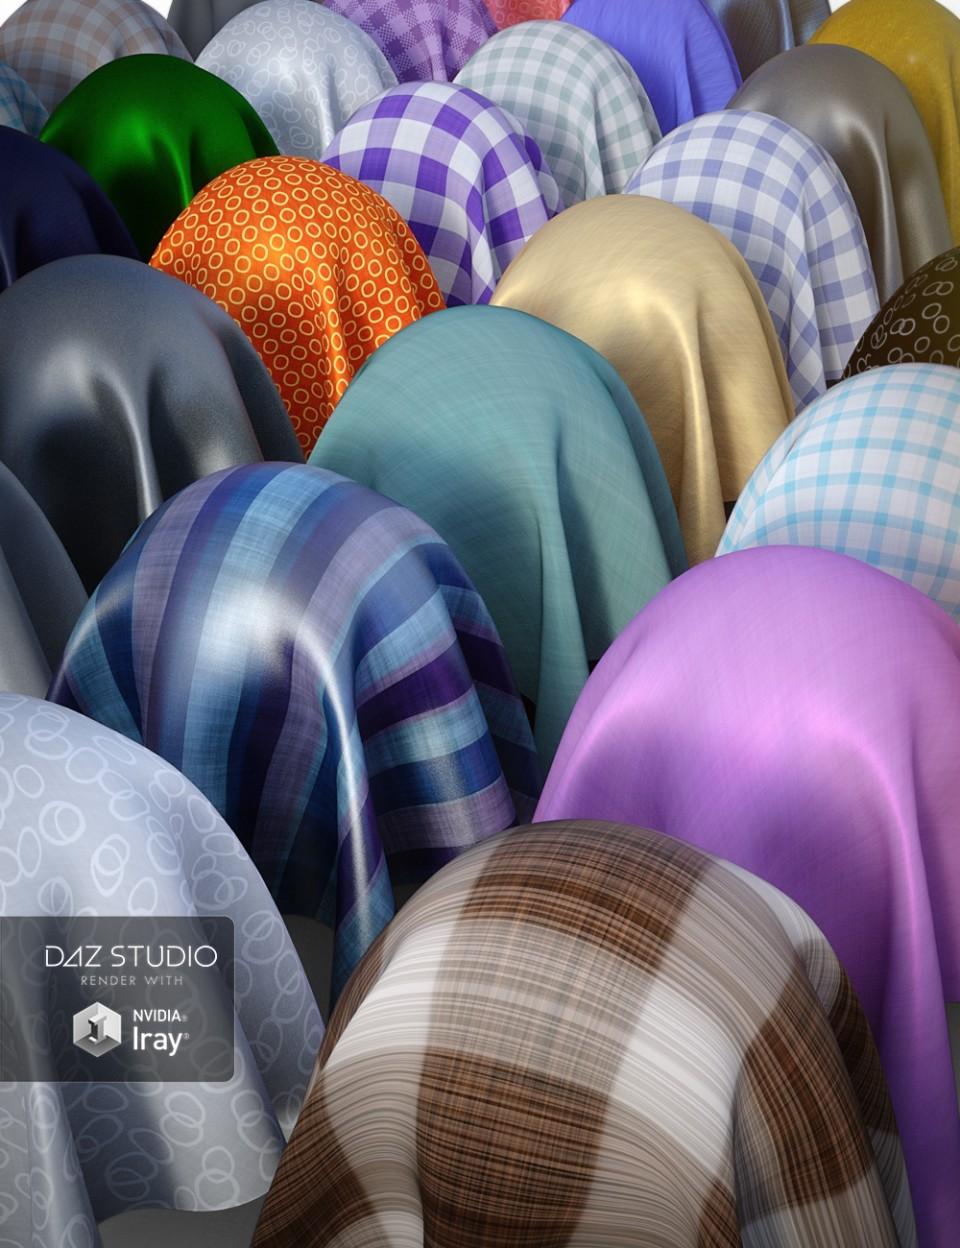 More Simple Fabric Iray Shaders_DAZ3D下载站